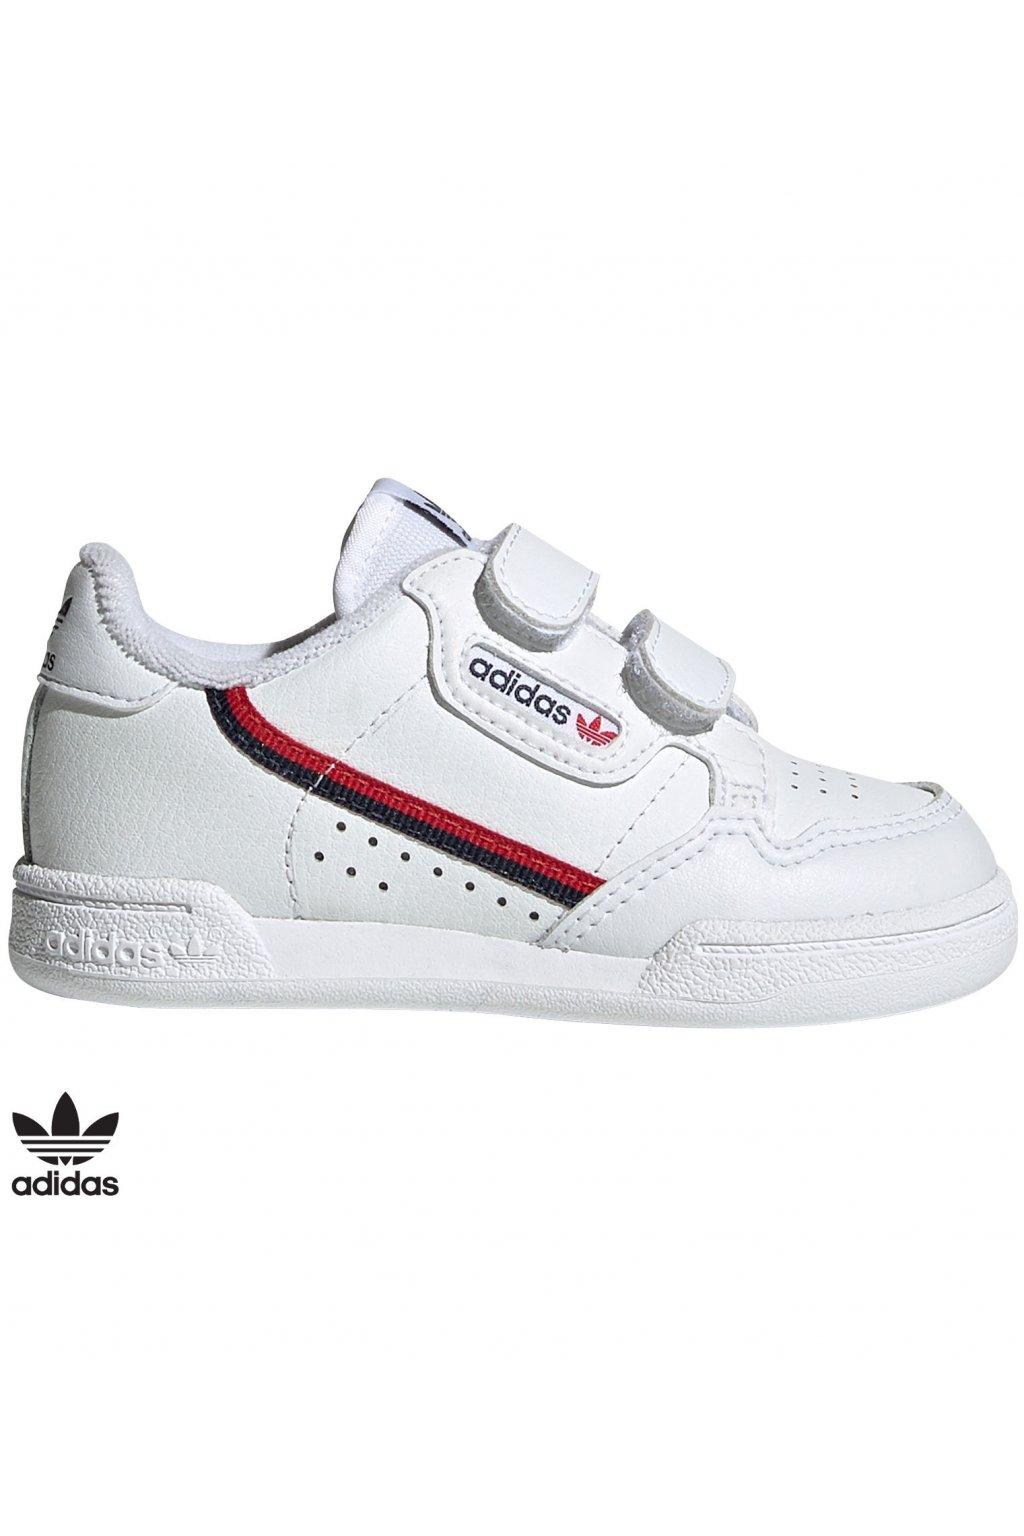 eh3230 detske tenisky adidas continental 80